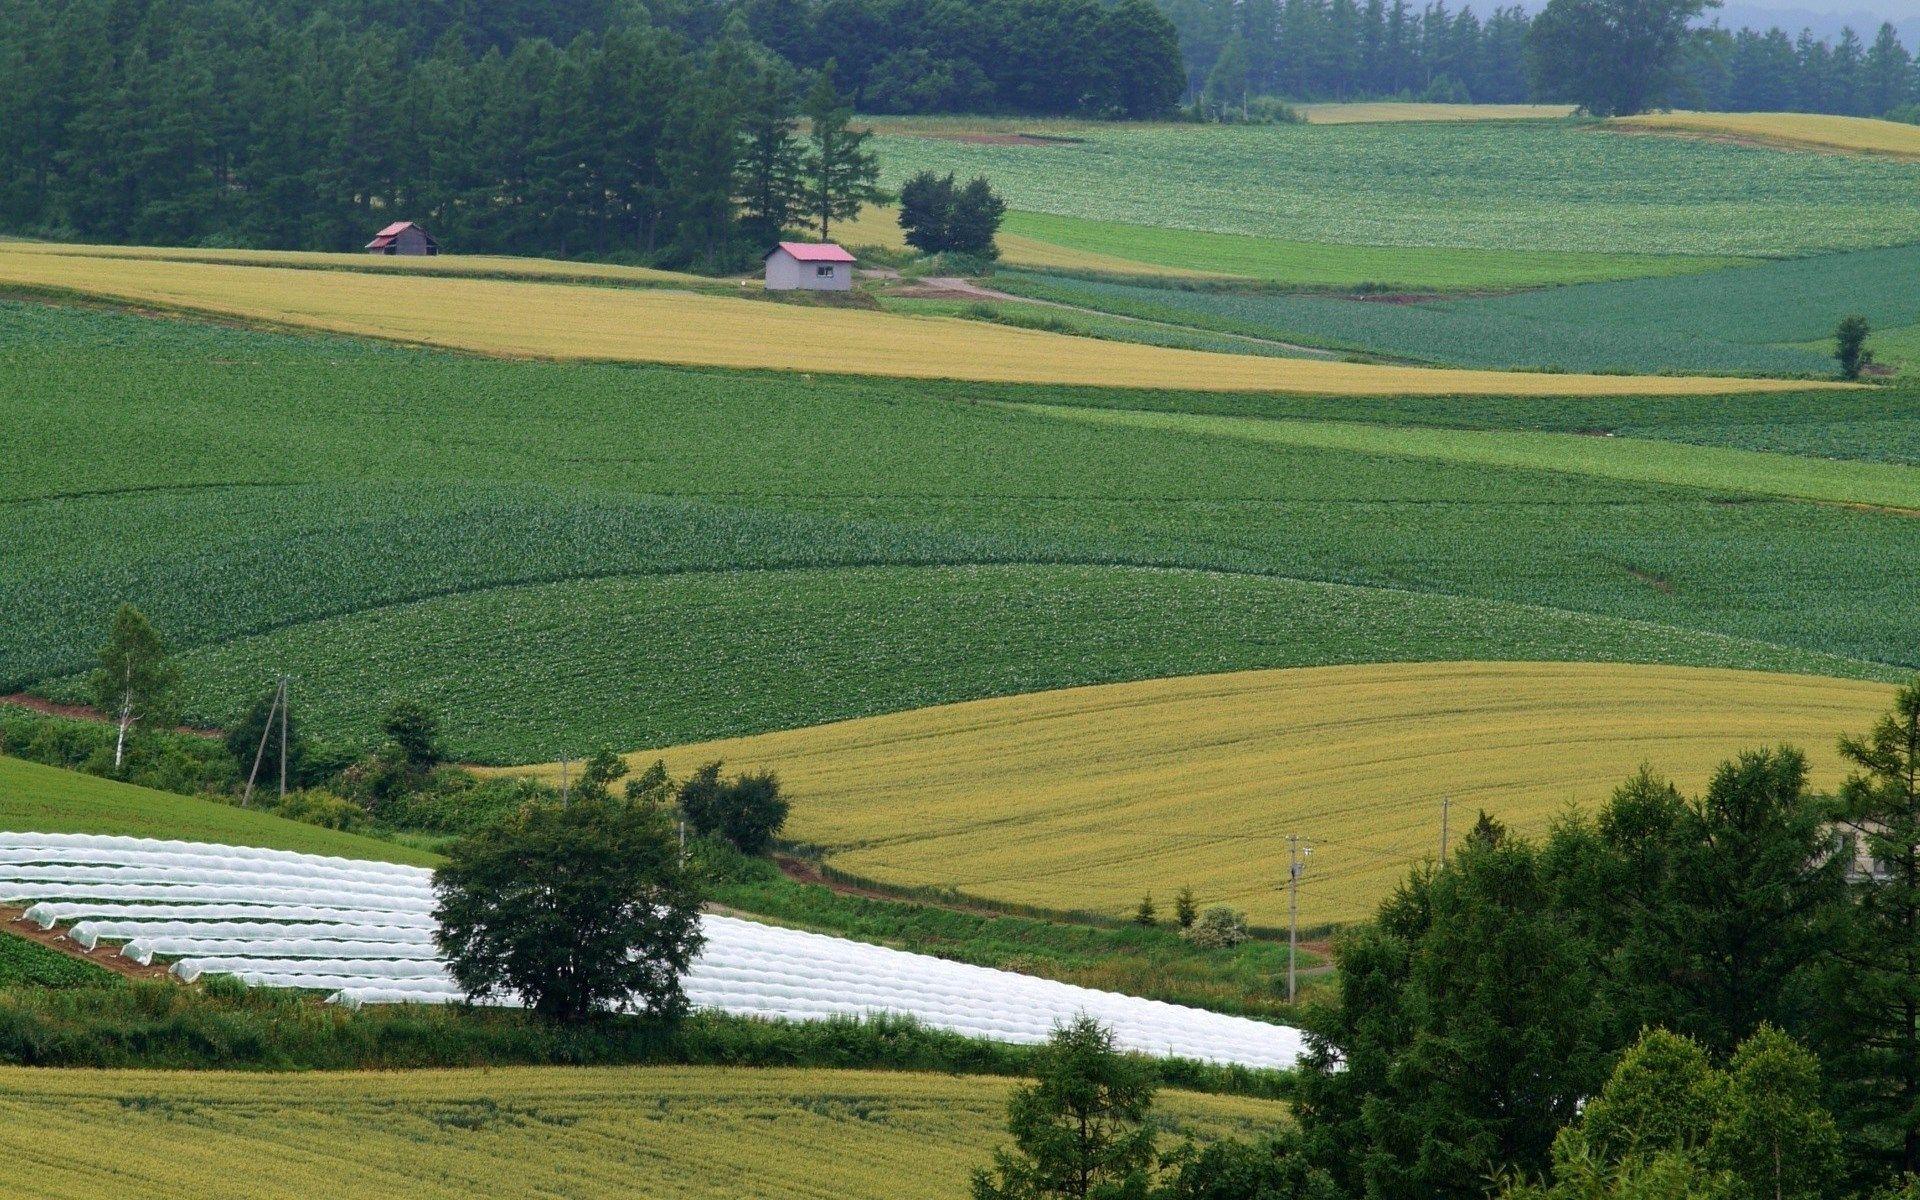 agriculture pic hd, Watson Kingsman 2016-09-13